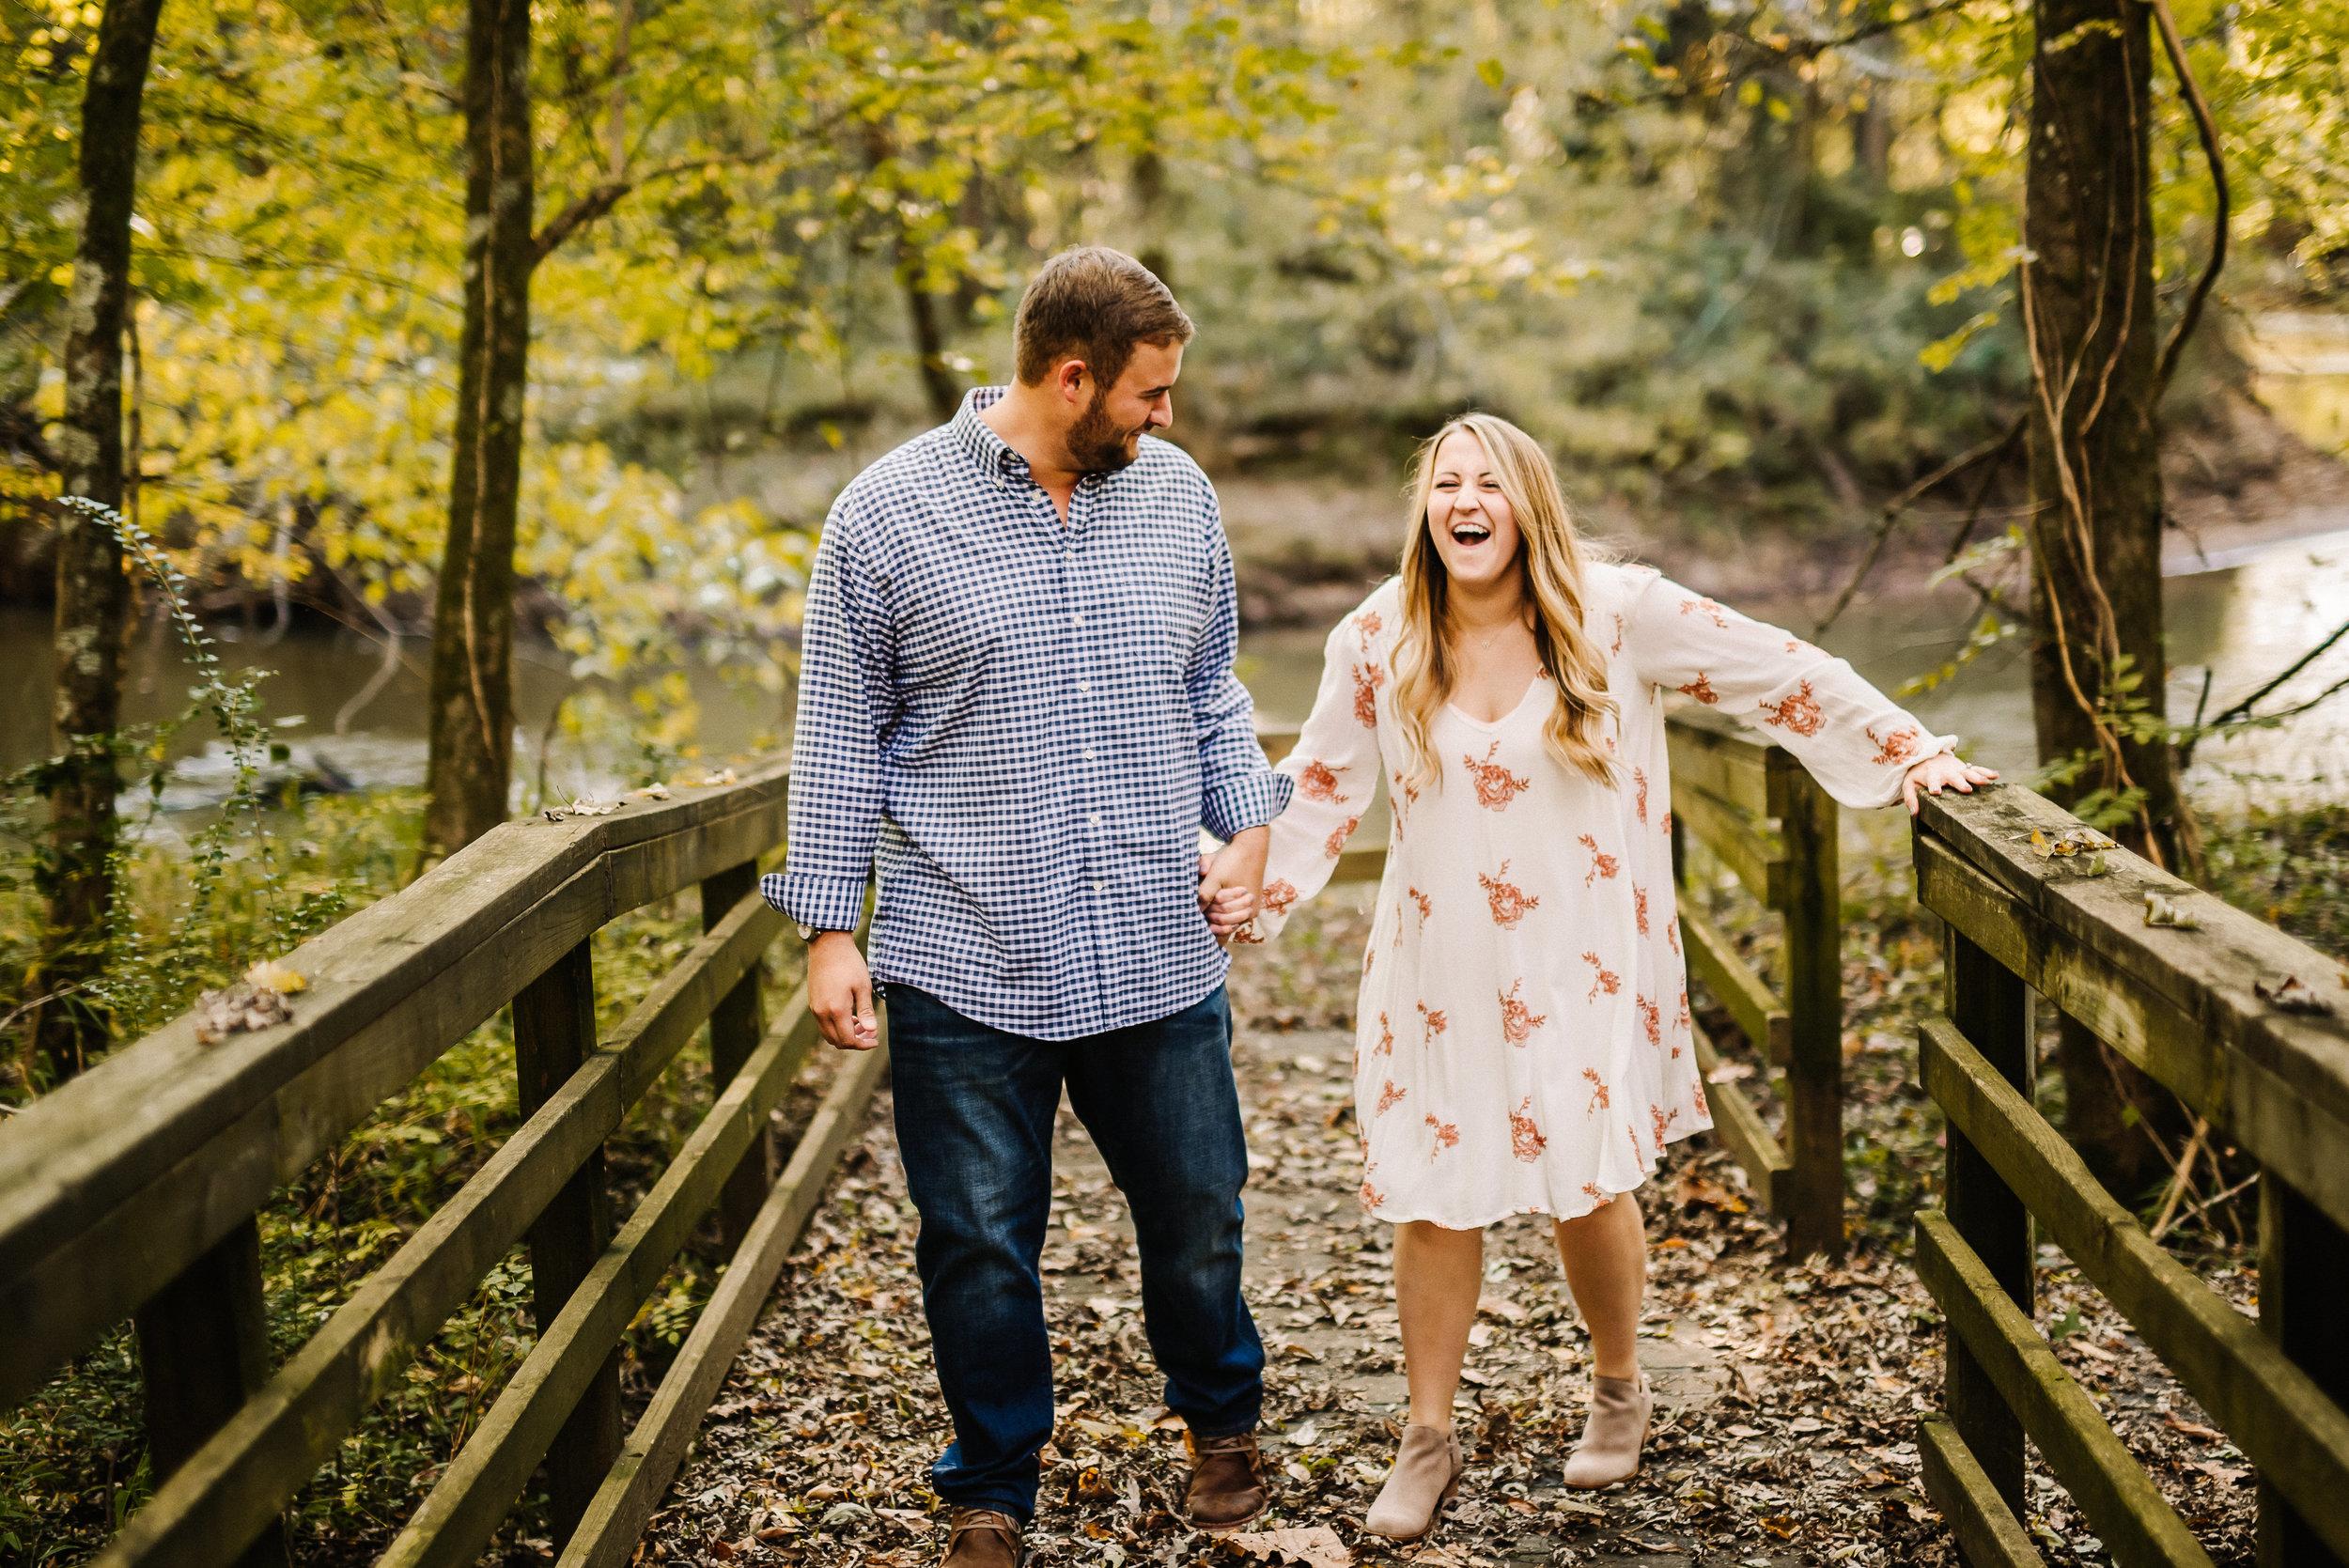 Romantic Fall Engagement Photography_Alexis & Jacob_Ashley Benham Photography-26.jpg